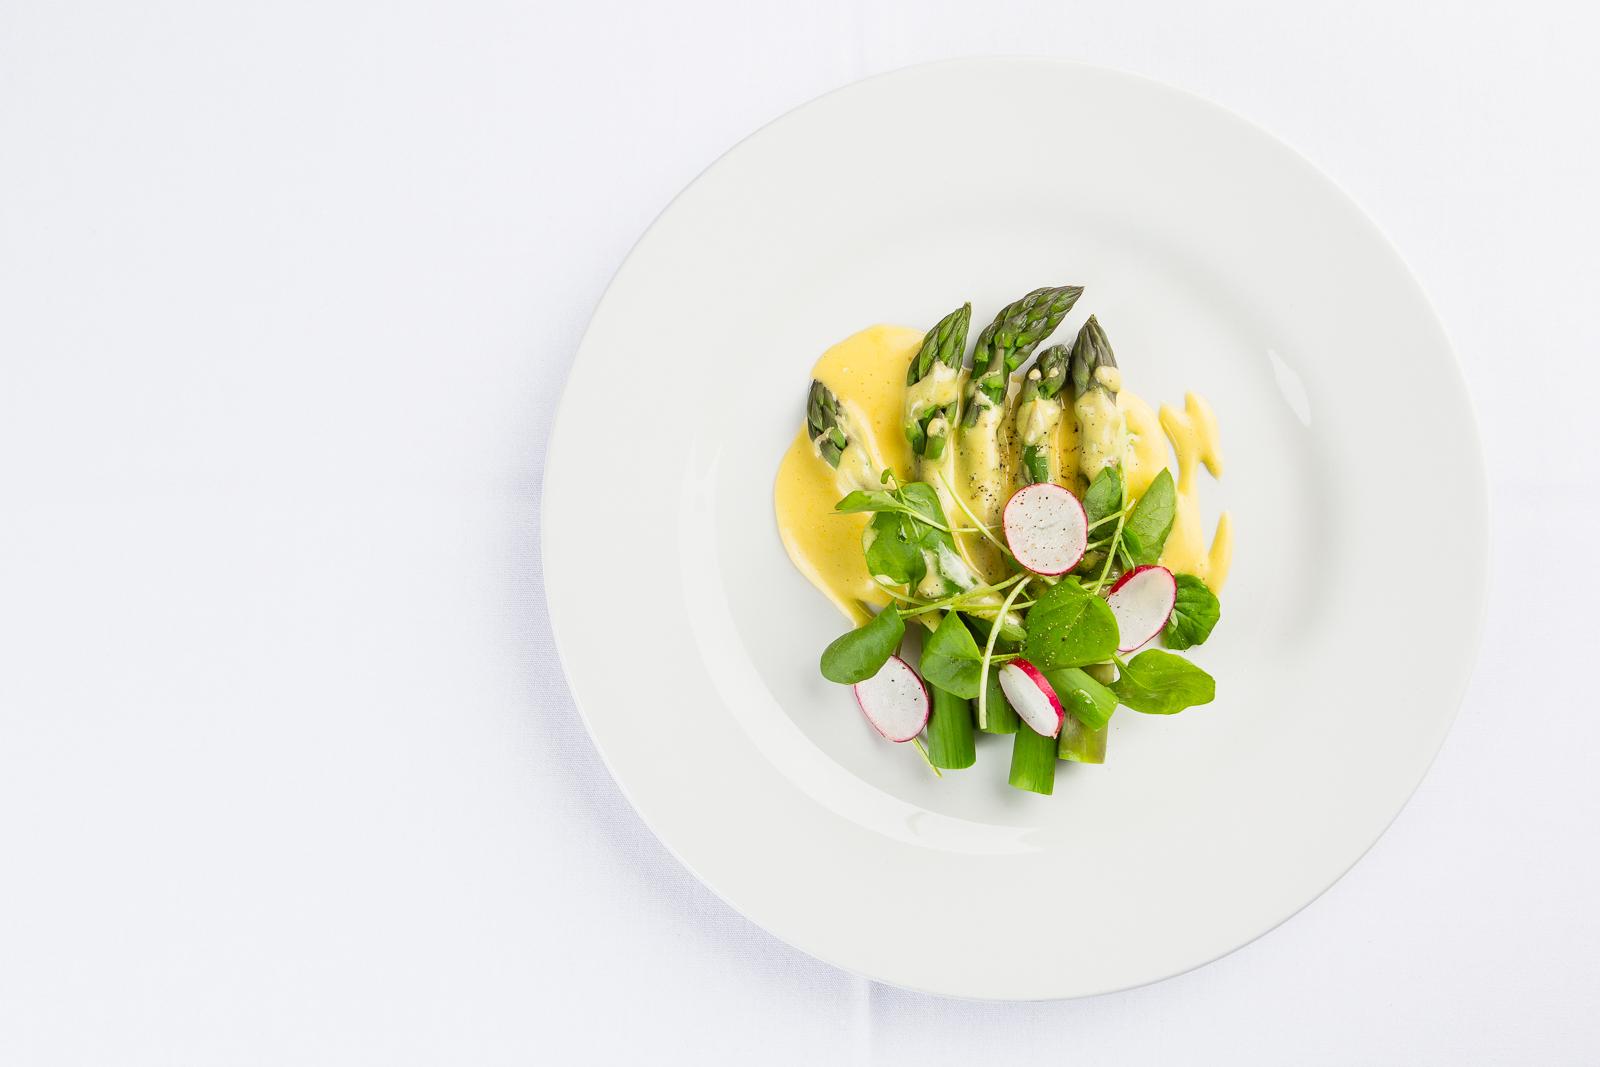 Neil Forbes Asparagus with Hollandaise WEB SIZE-CMPL0975-Edit.jpg